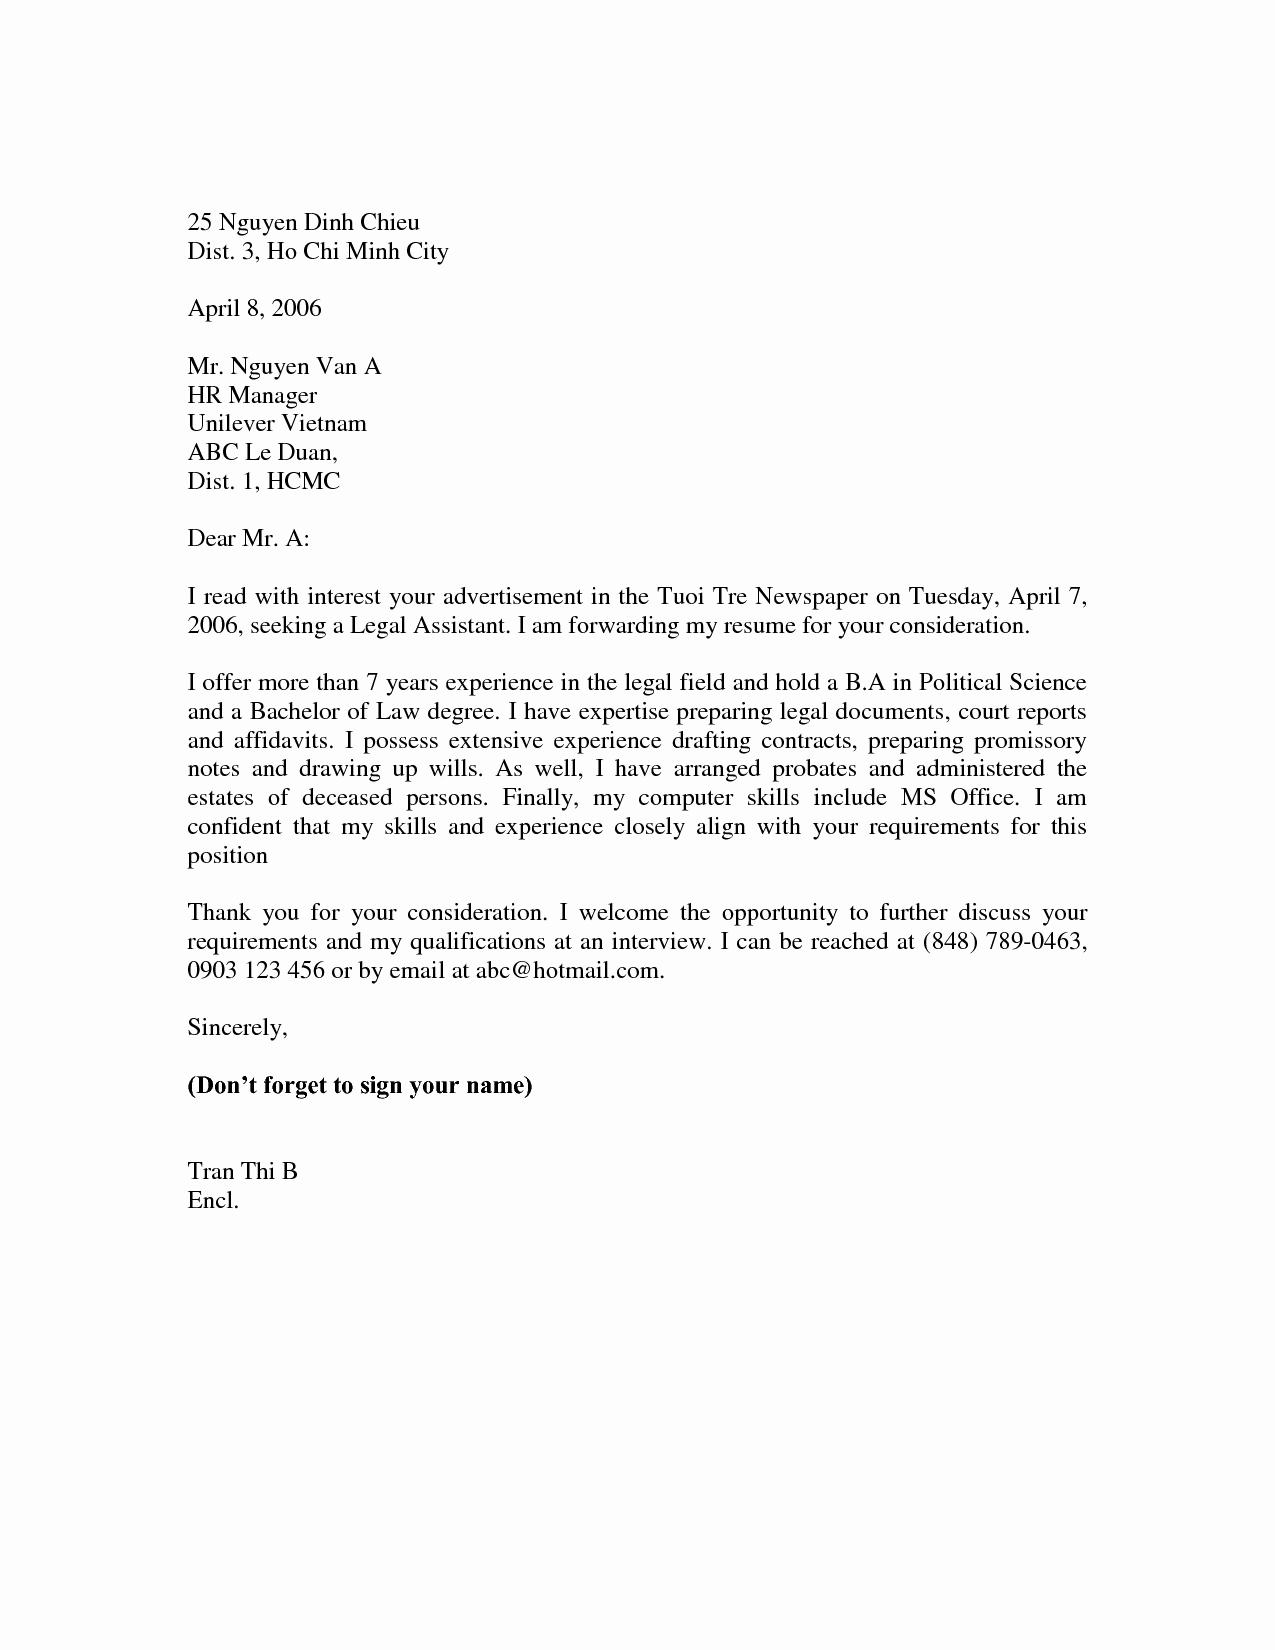 Basic Cover Letter for Resume Examples